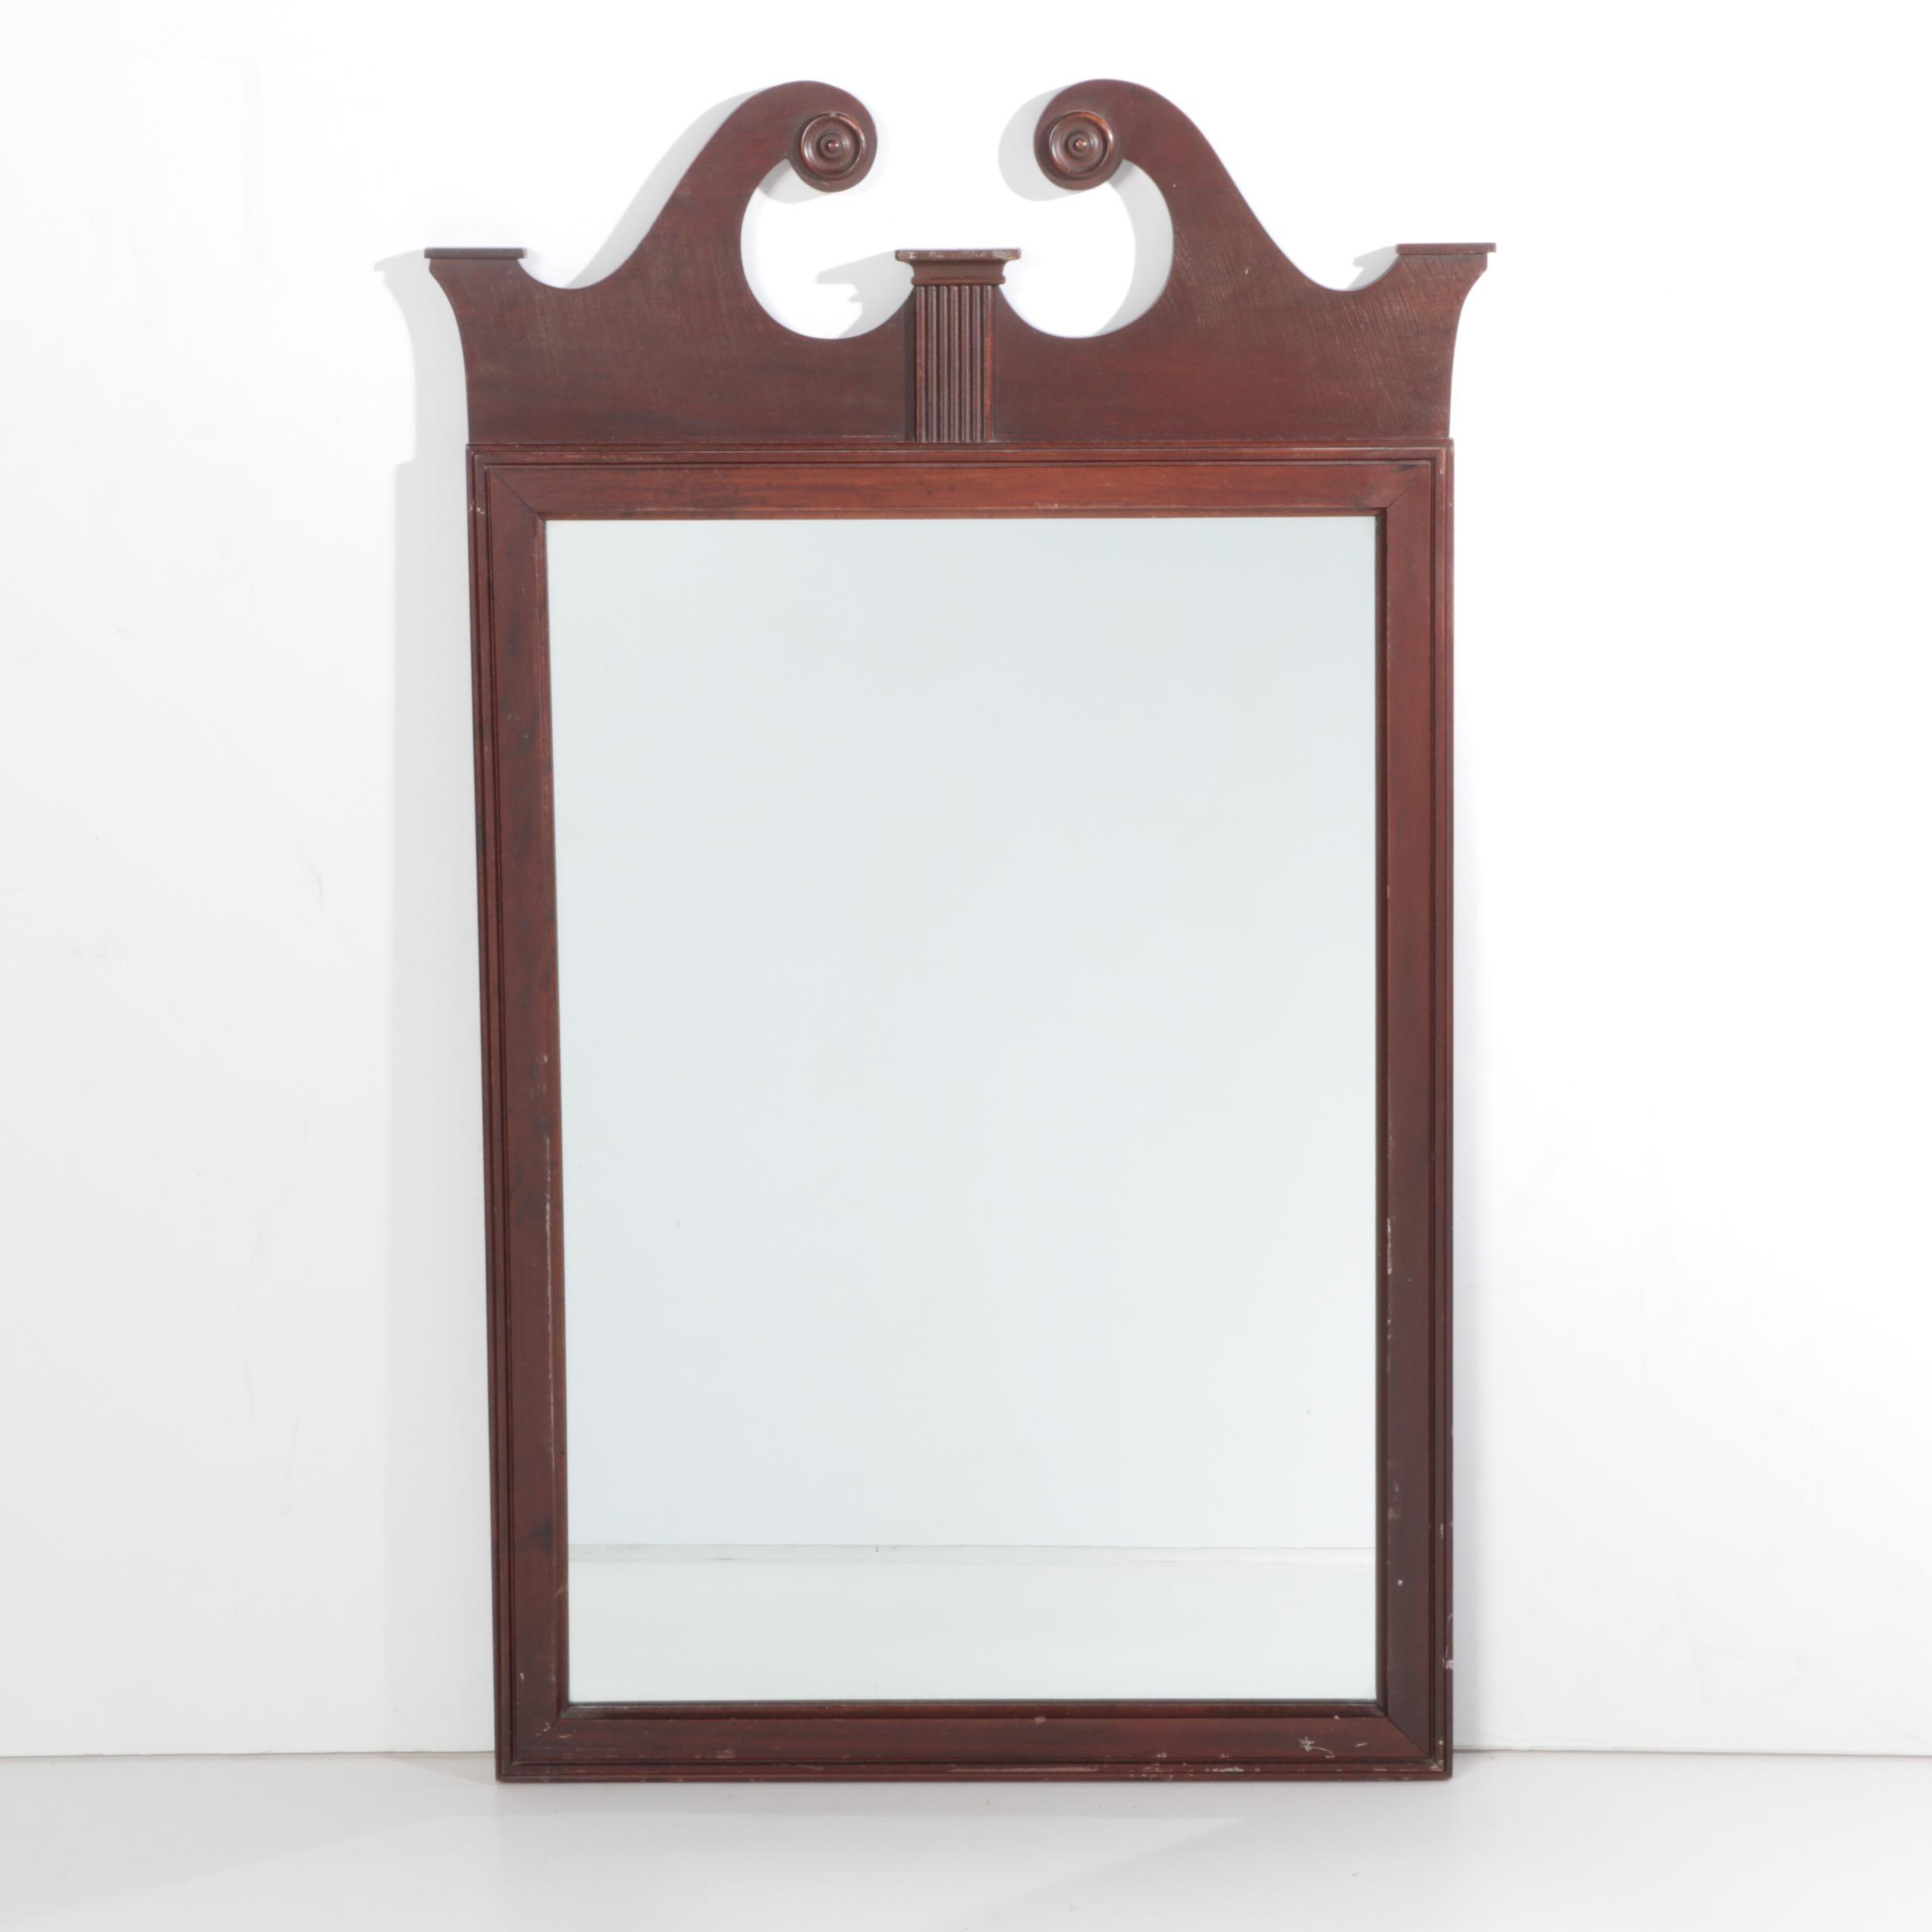 Georgian Style Wall Mirror with Pediment